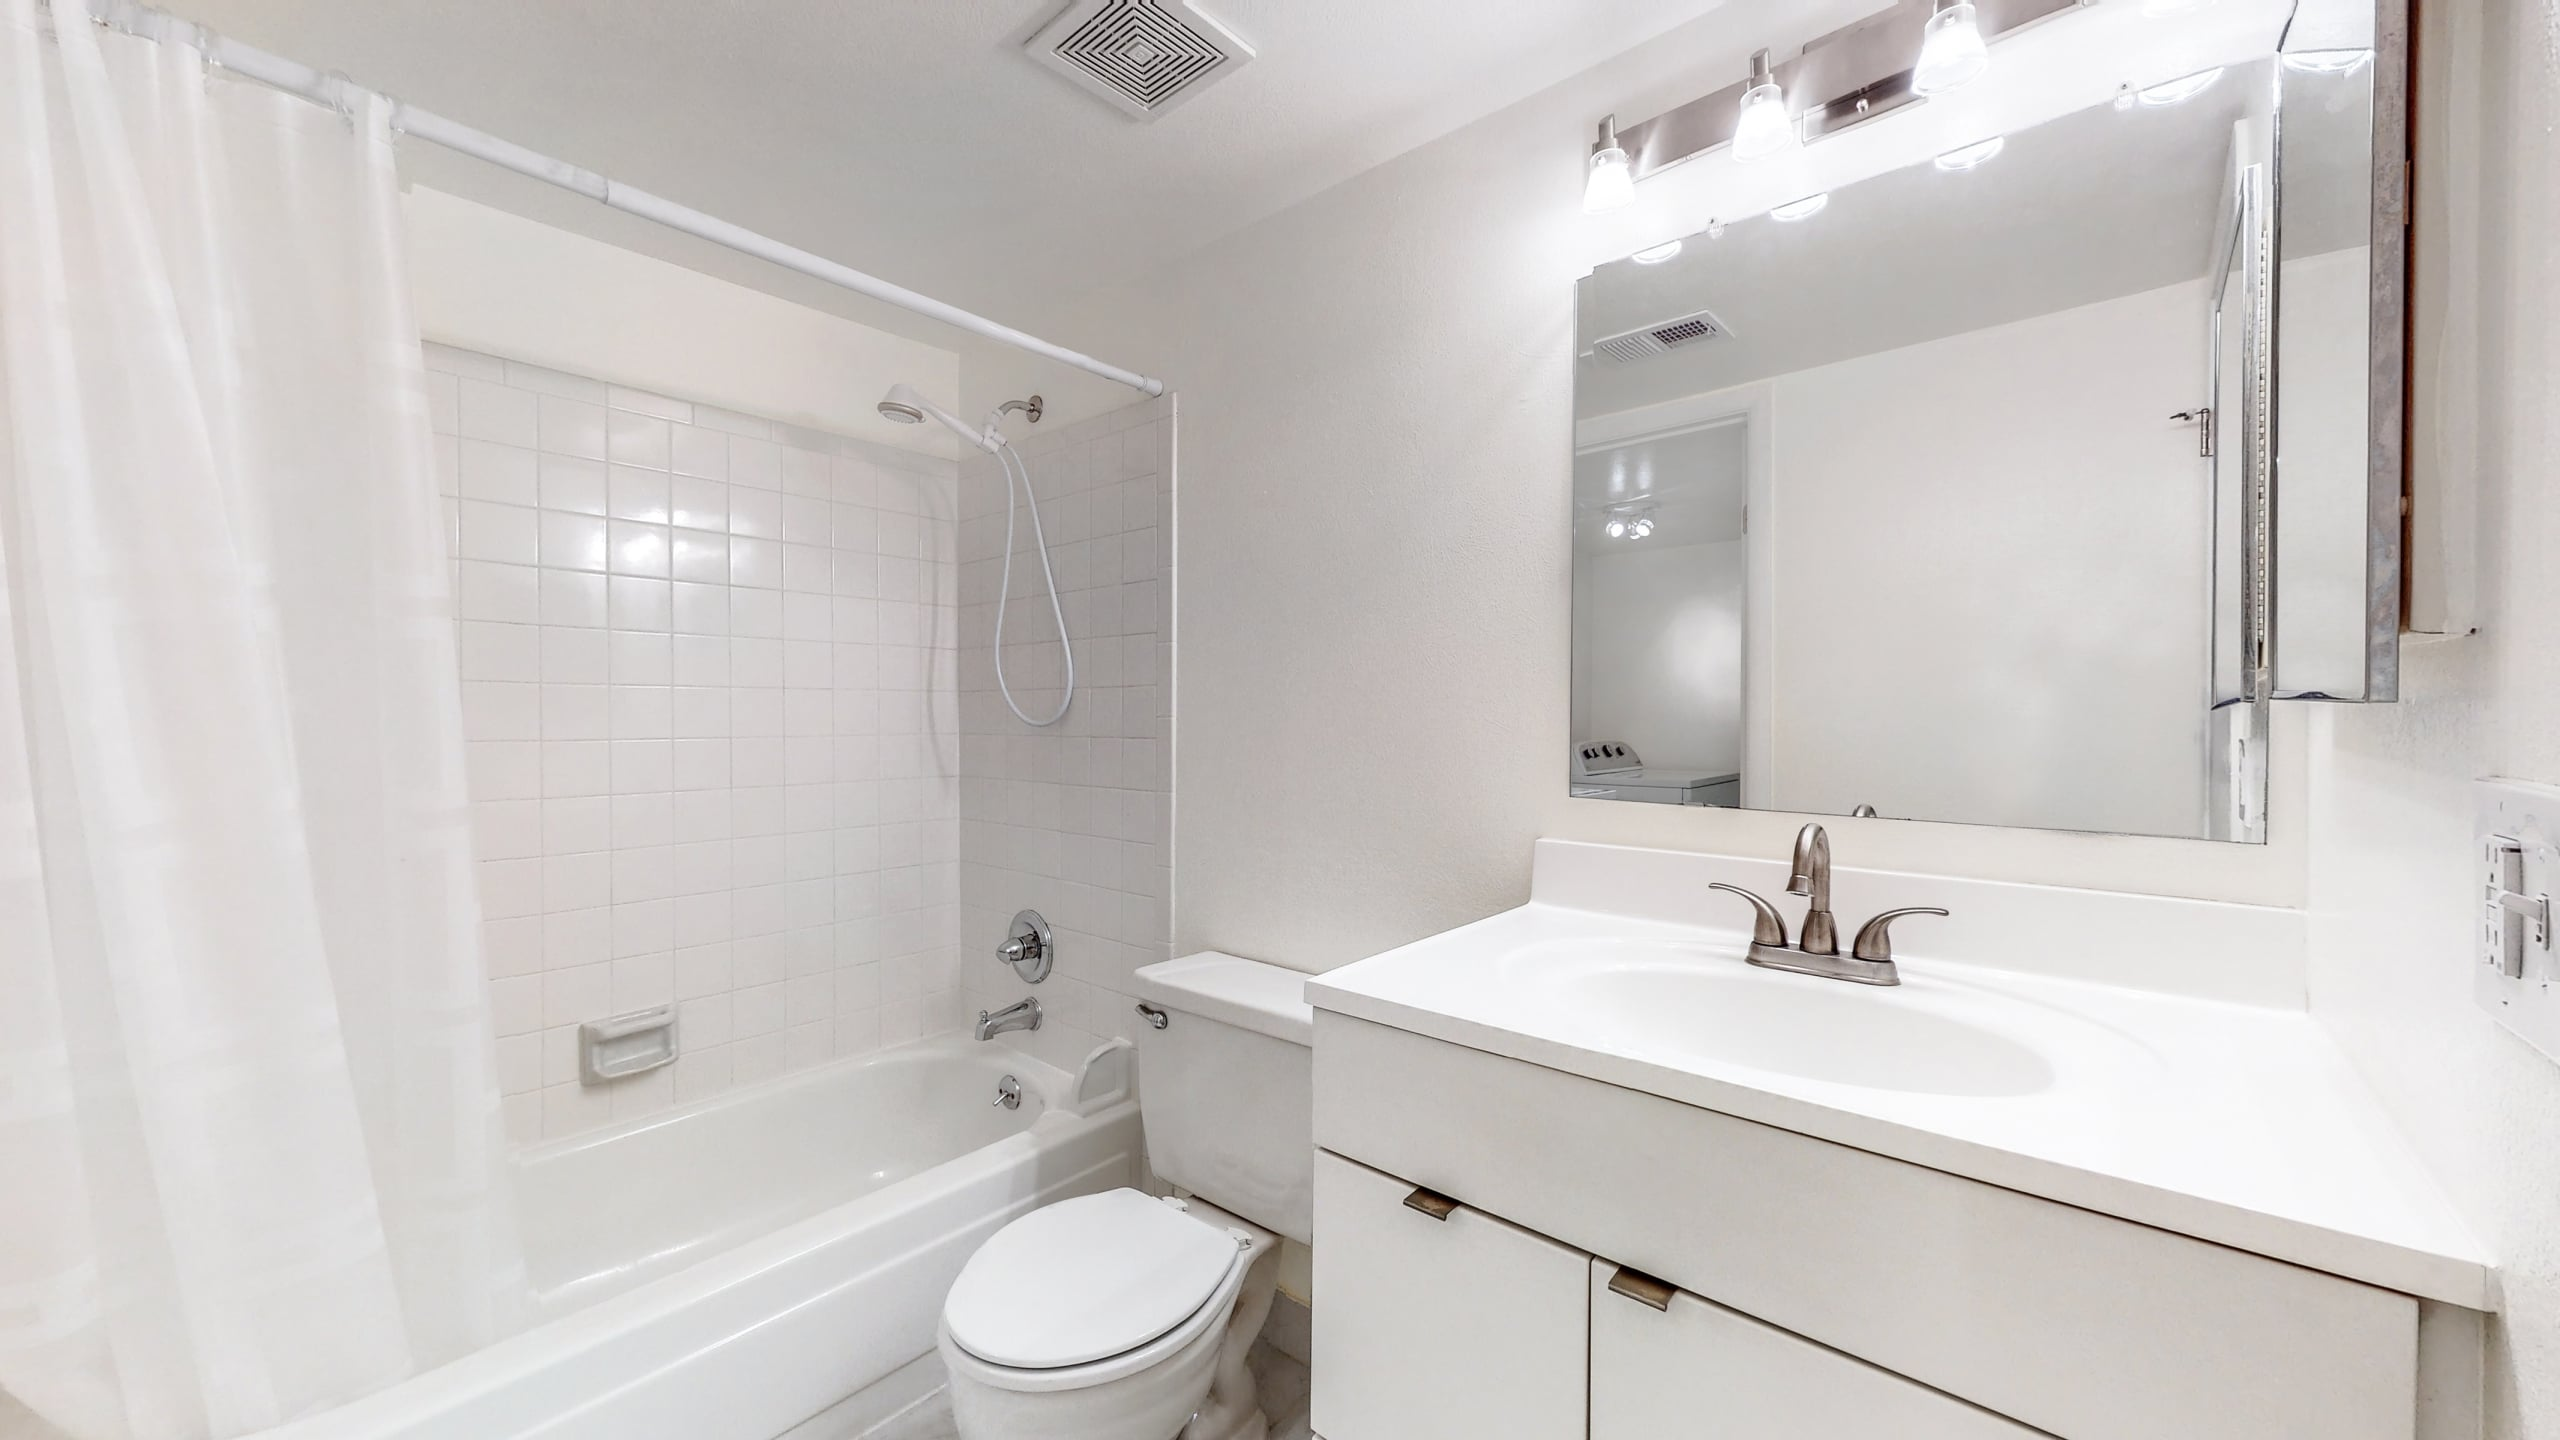 White bathroom in Aurora, CO condo at Spinnaker Run II